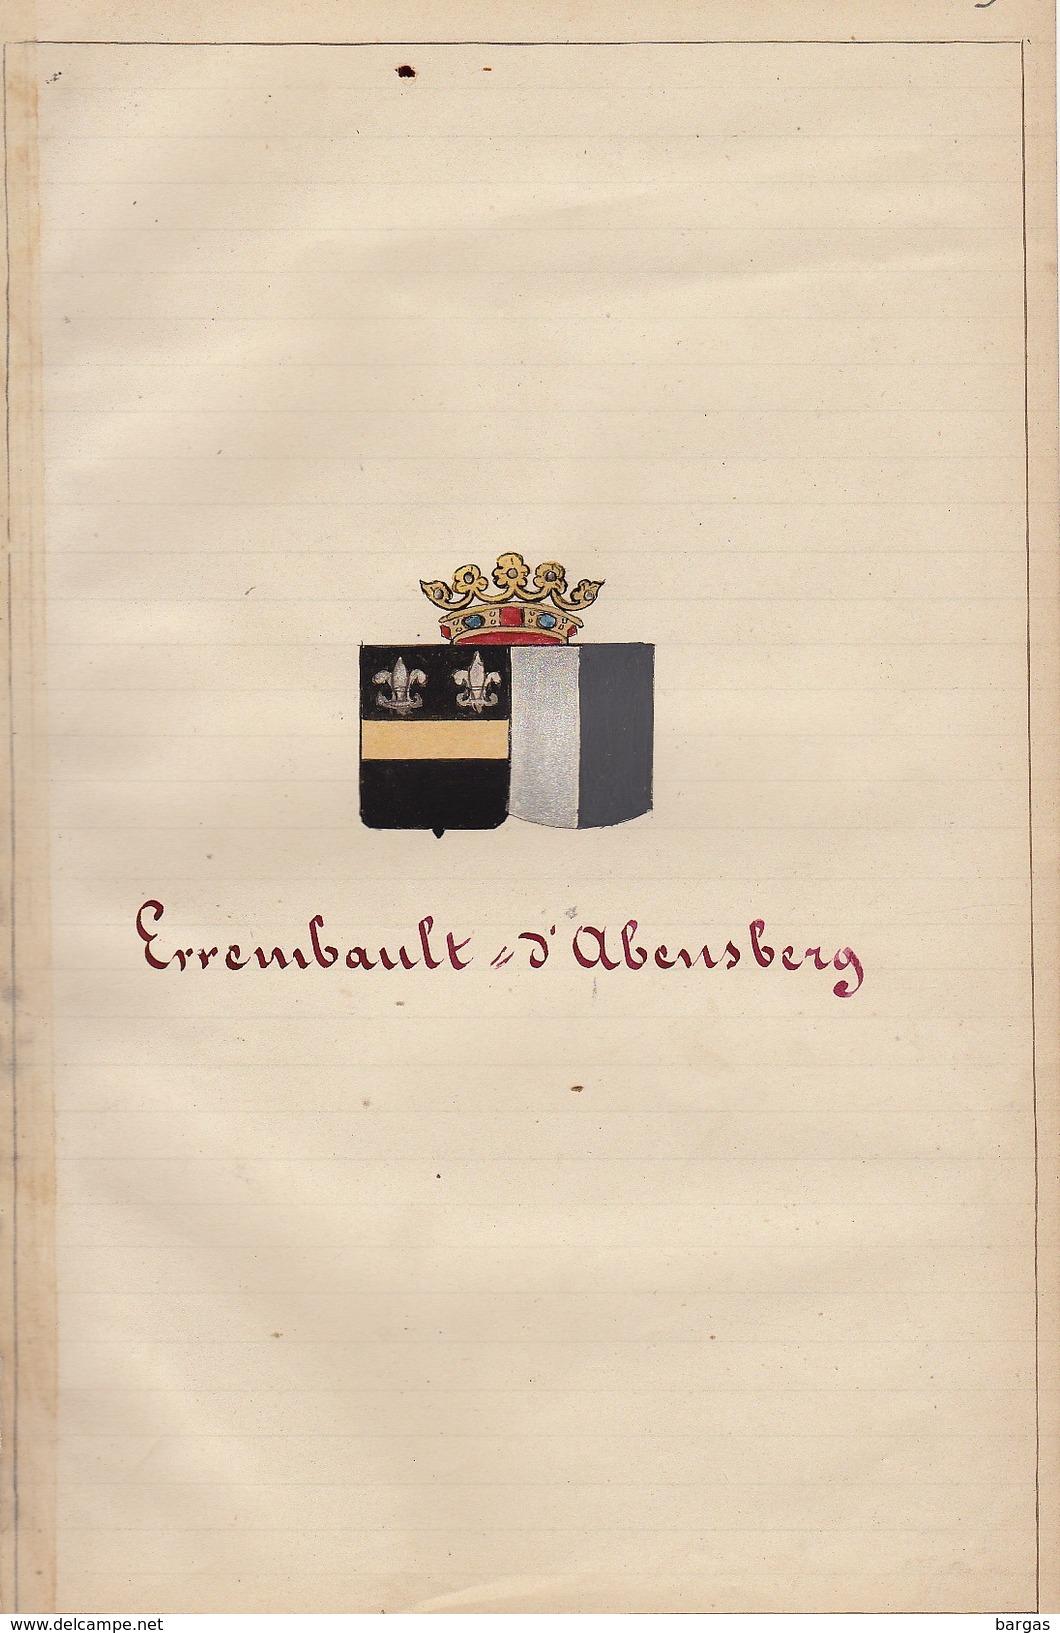 Manuscrit Généalogie Héraldique Errembault Comte De Dudzeele D'Abensberg Comtesse De Traun App. Ayasasa ... - Manuscripts